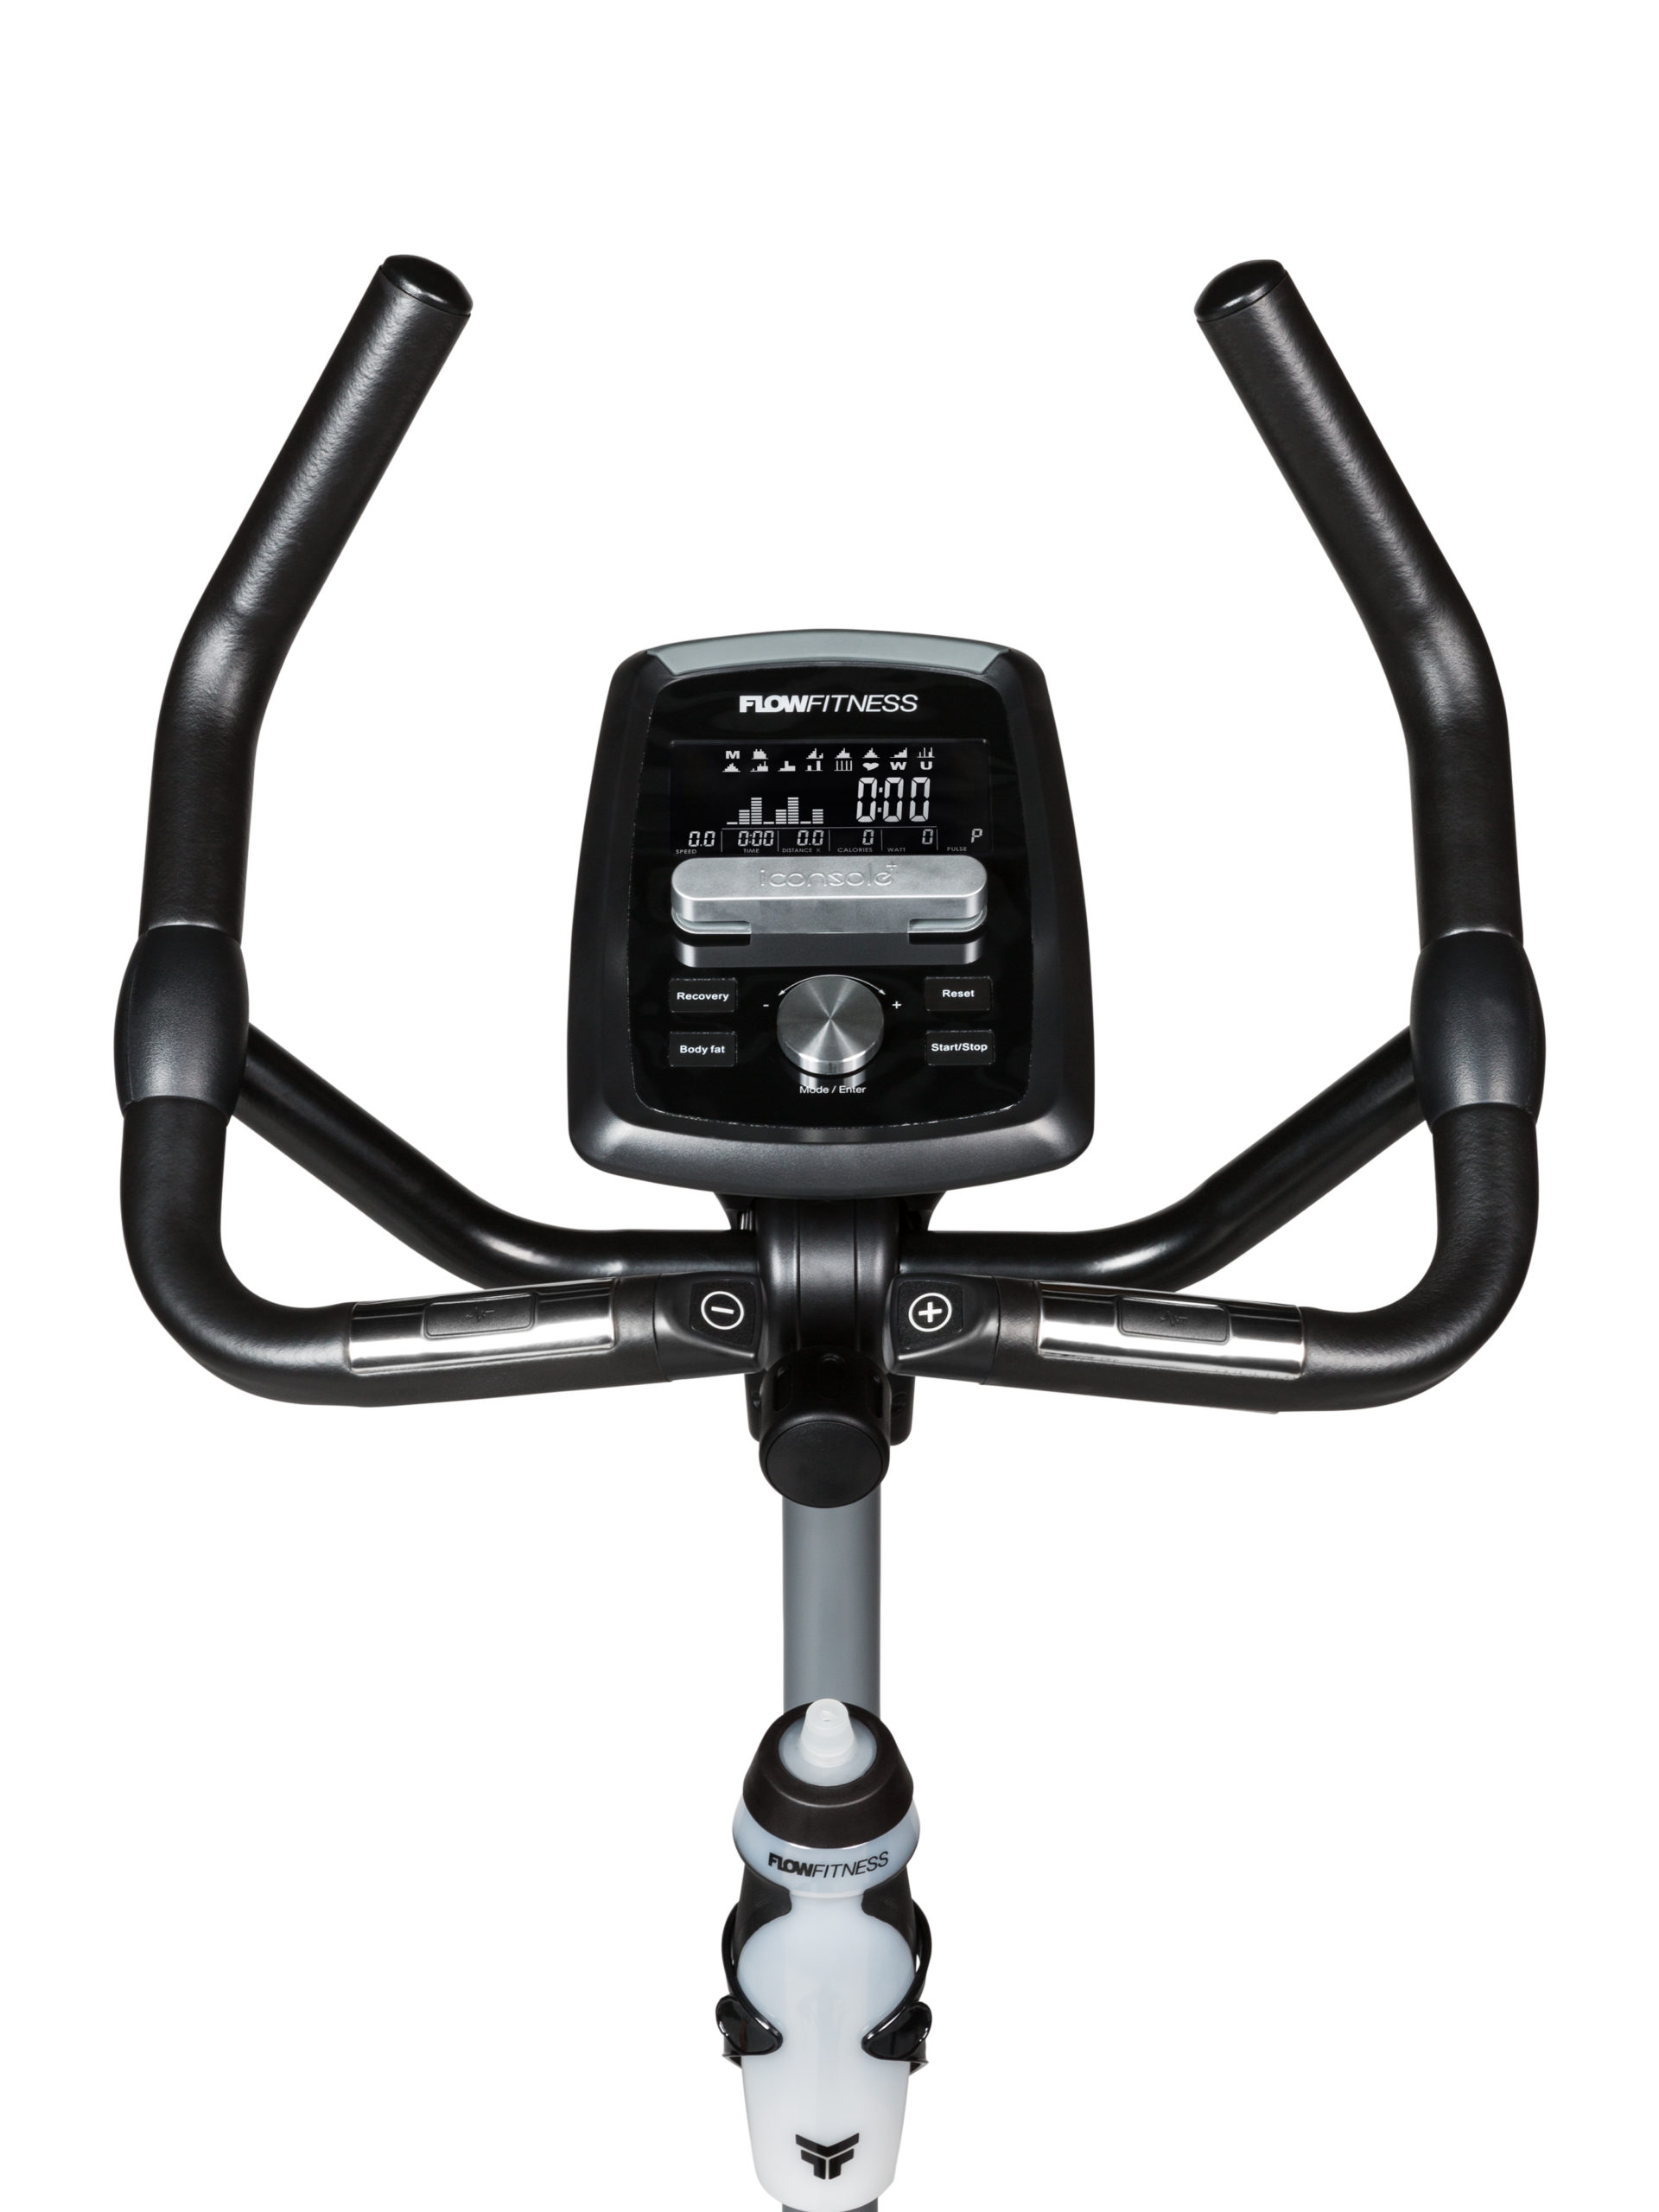 Flow Fitness Tabel Turner DHT2500i Hometrainer 3